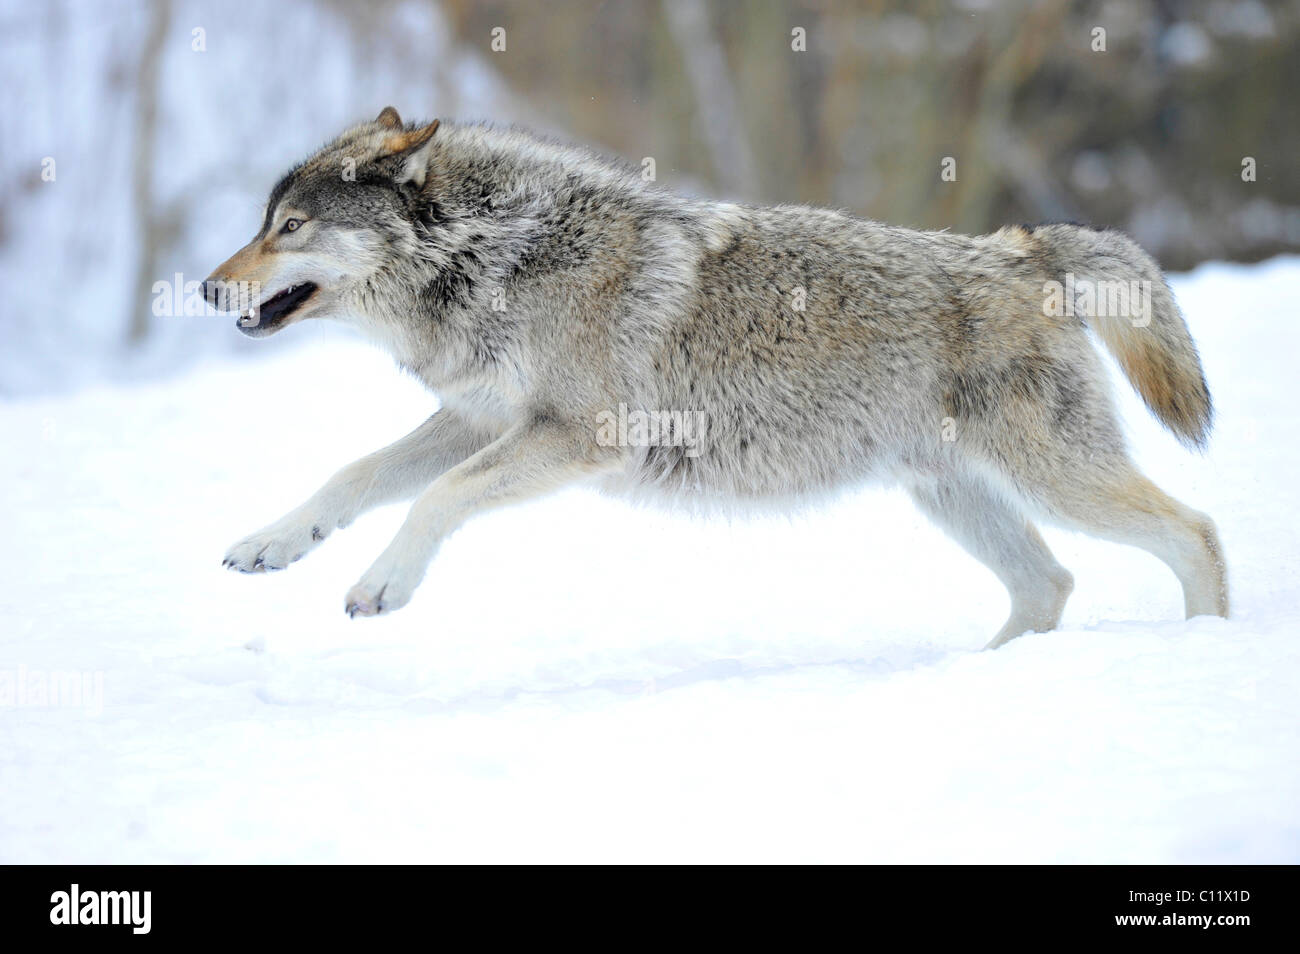 Mackenzie valley wolf - photo#28